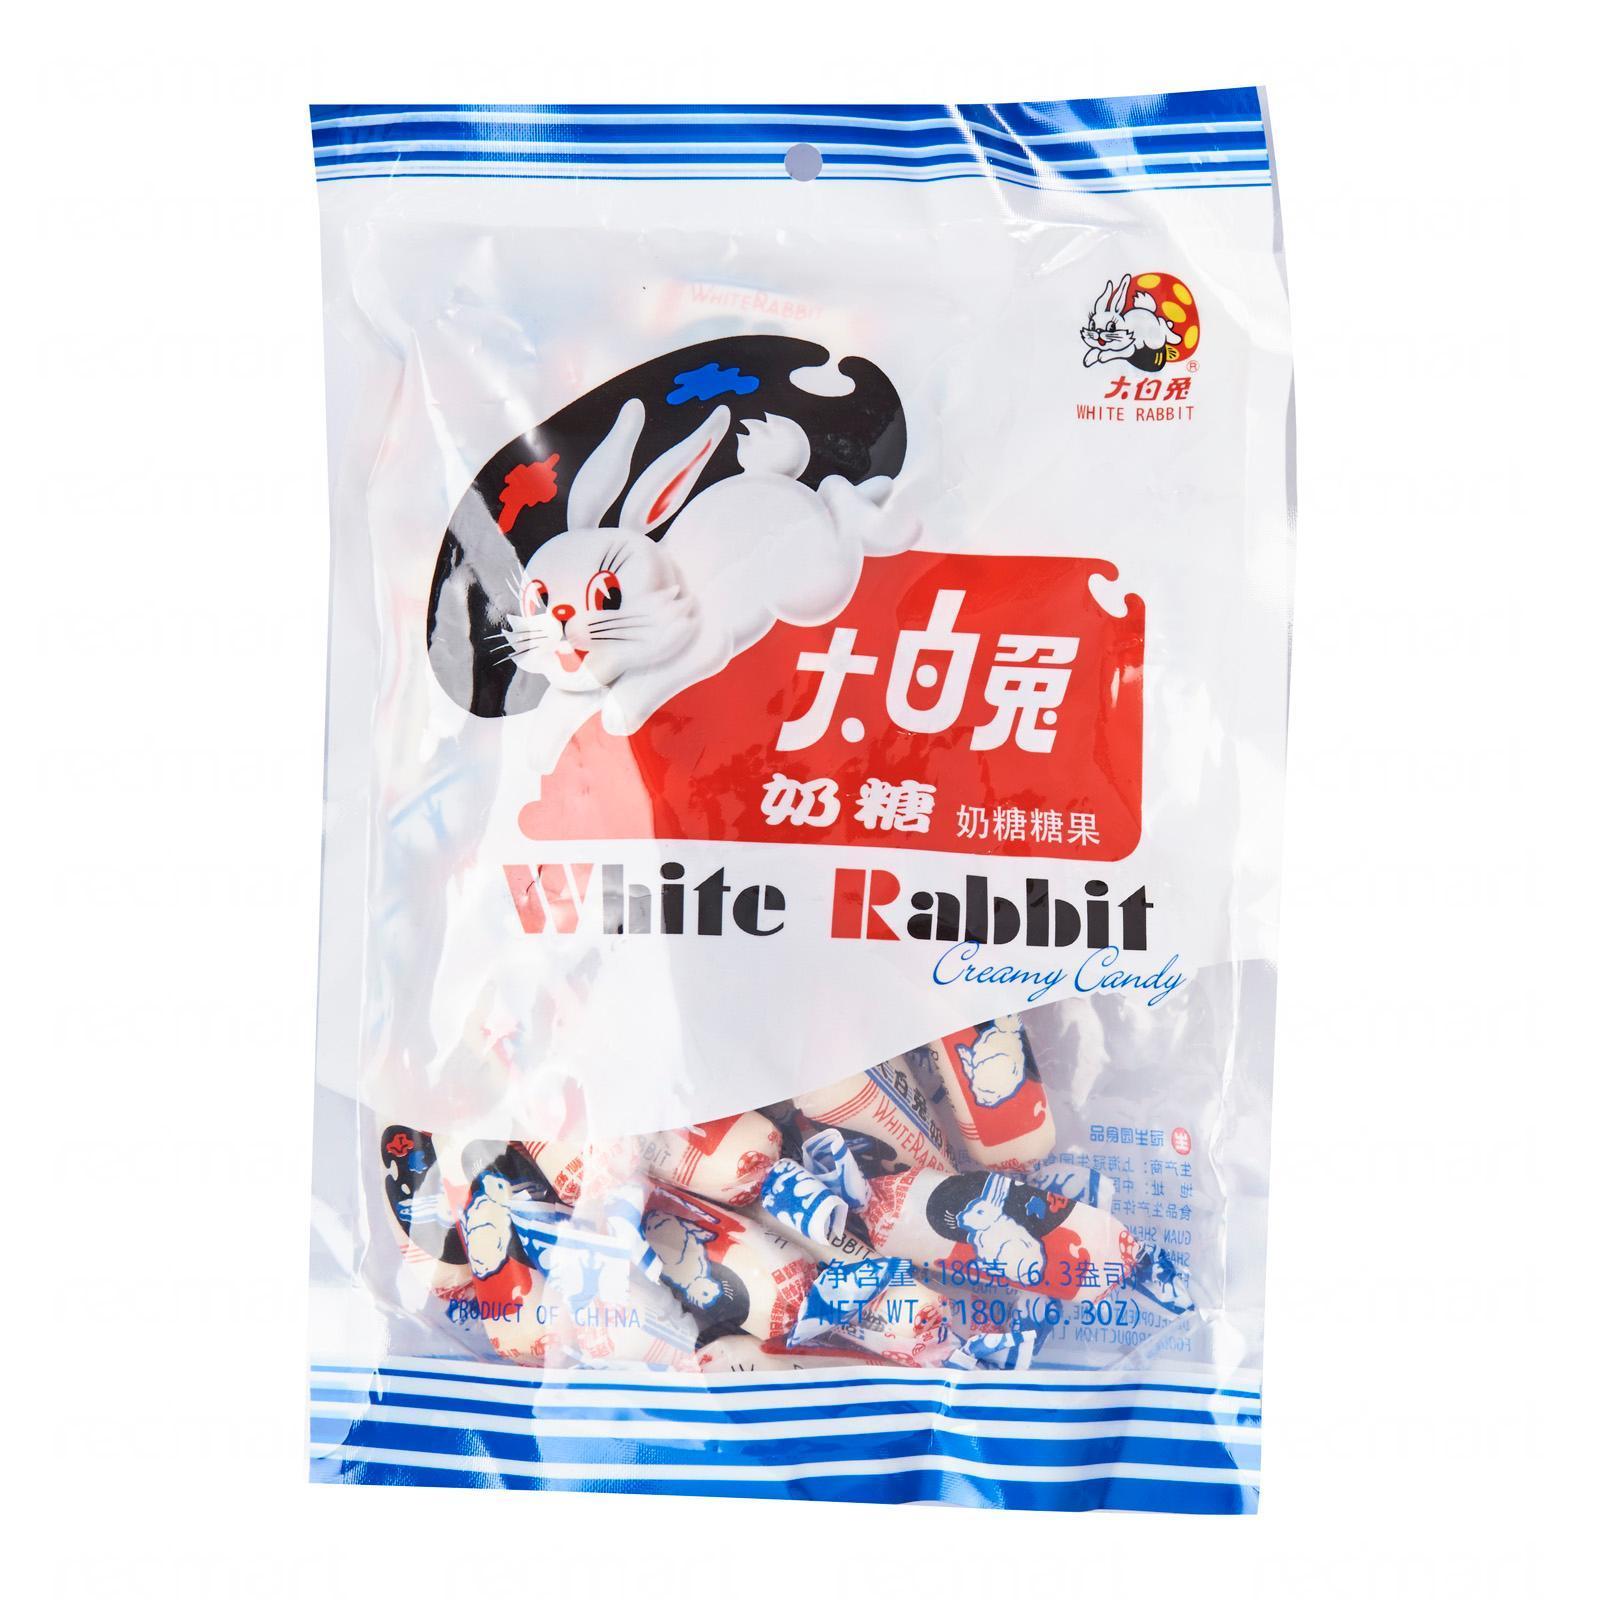 White Rabbit Creamy Candy By Redmart.